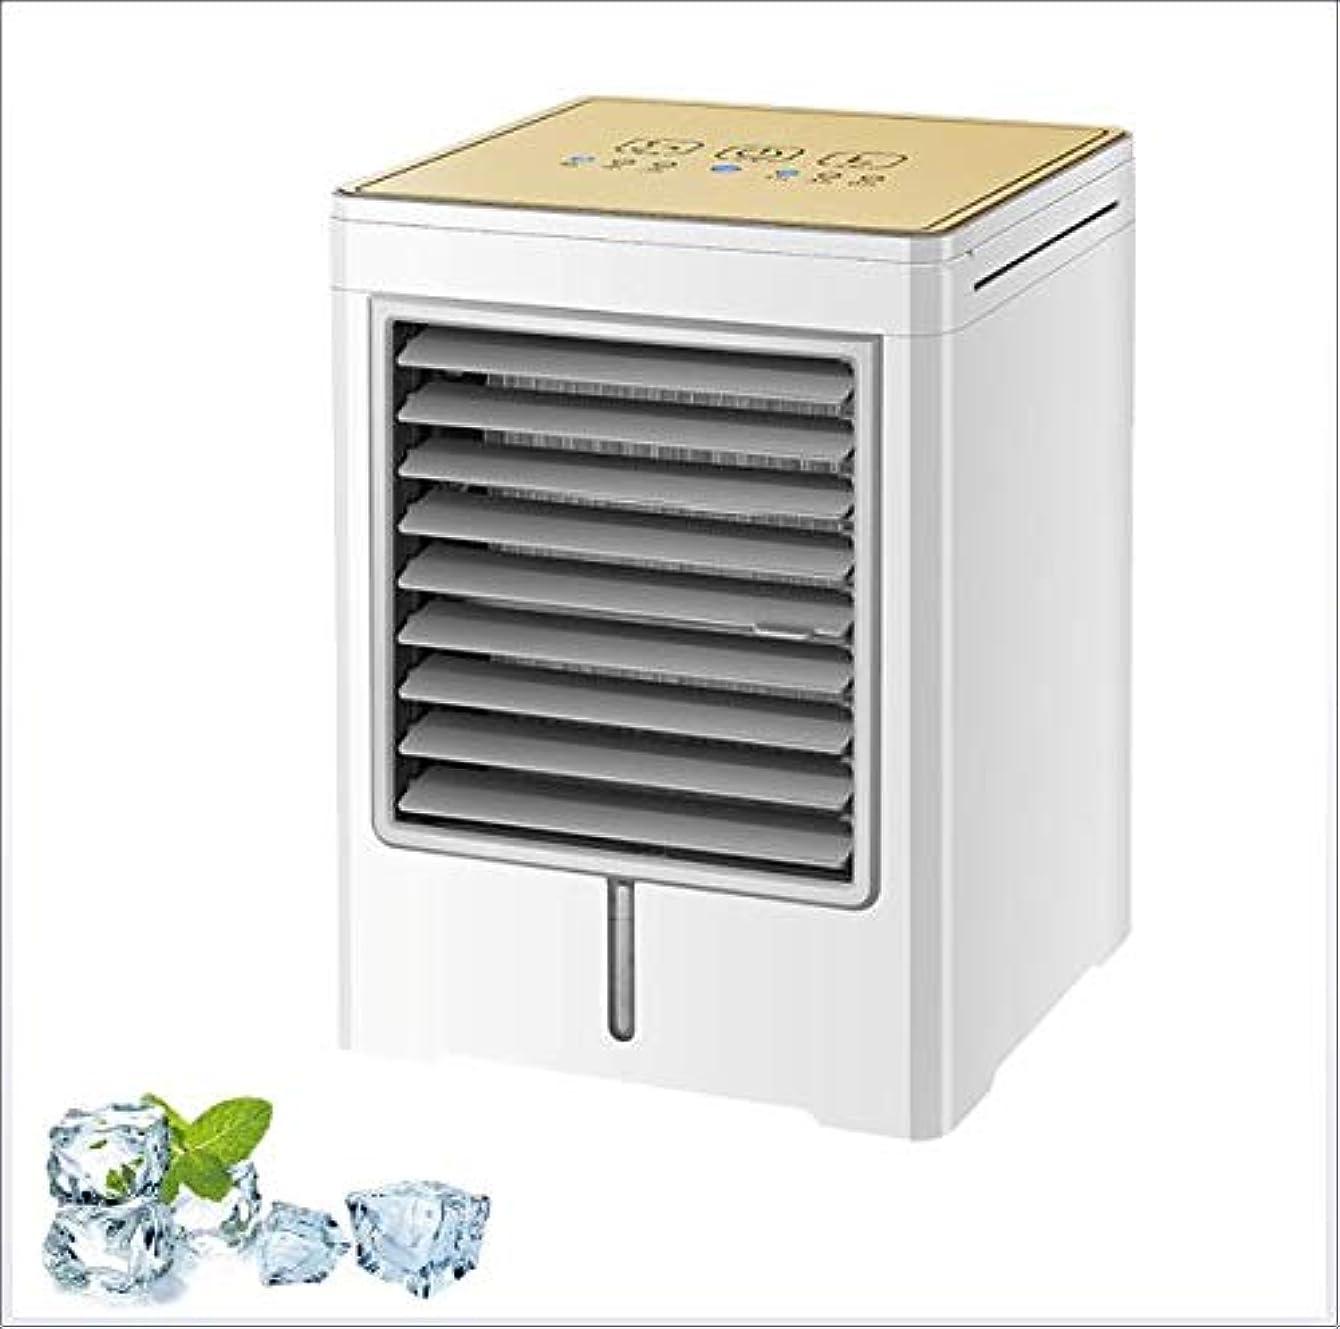 LBJ Portable Air Conditioner Chiller, Personal Air Cooler, USB Mini, Desktop Evaporative Air Cooler, Air Conditioning Fan